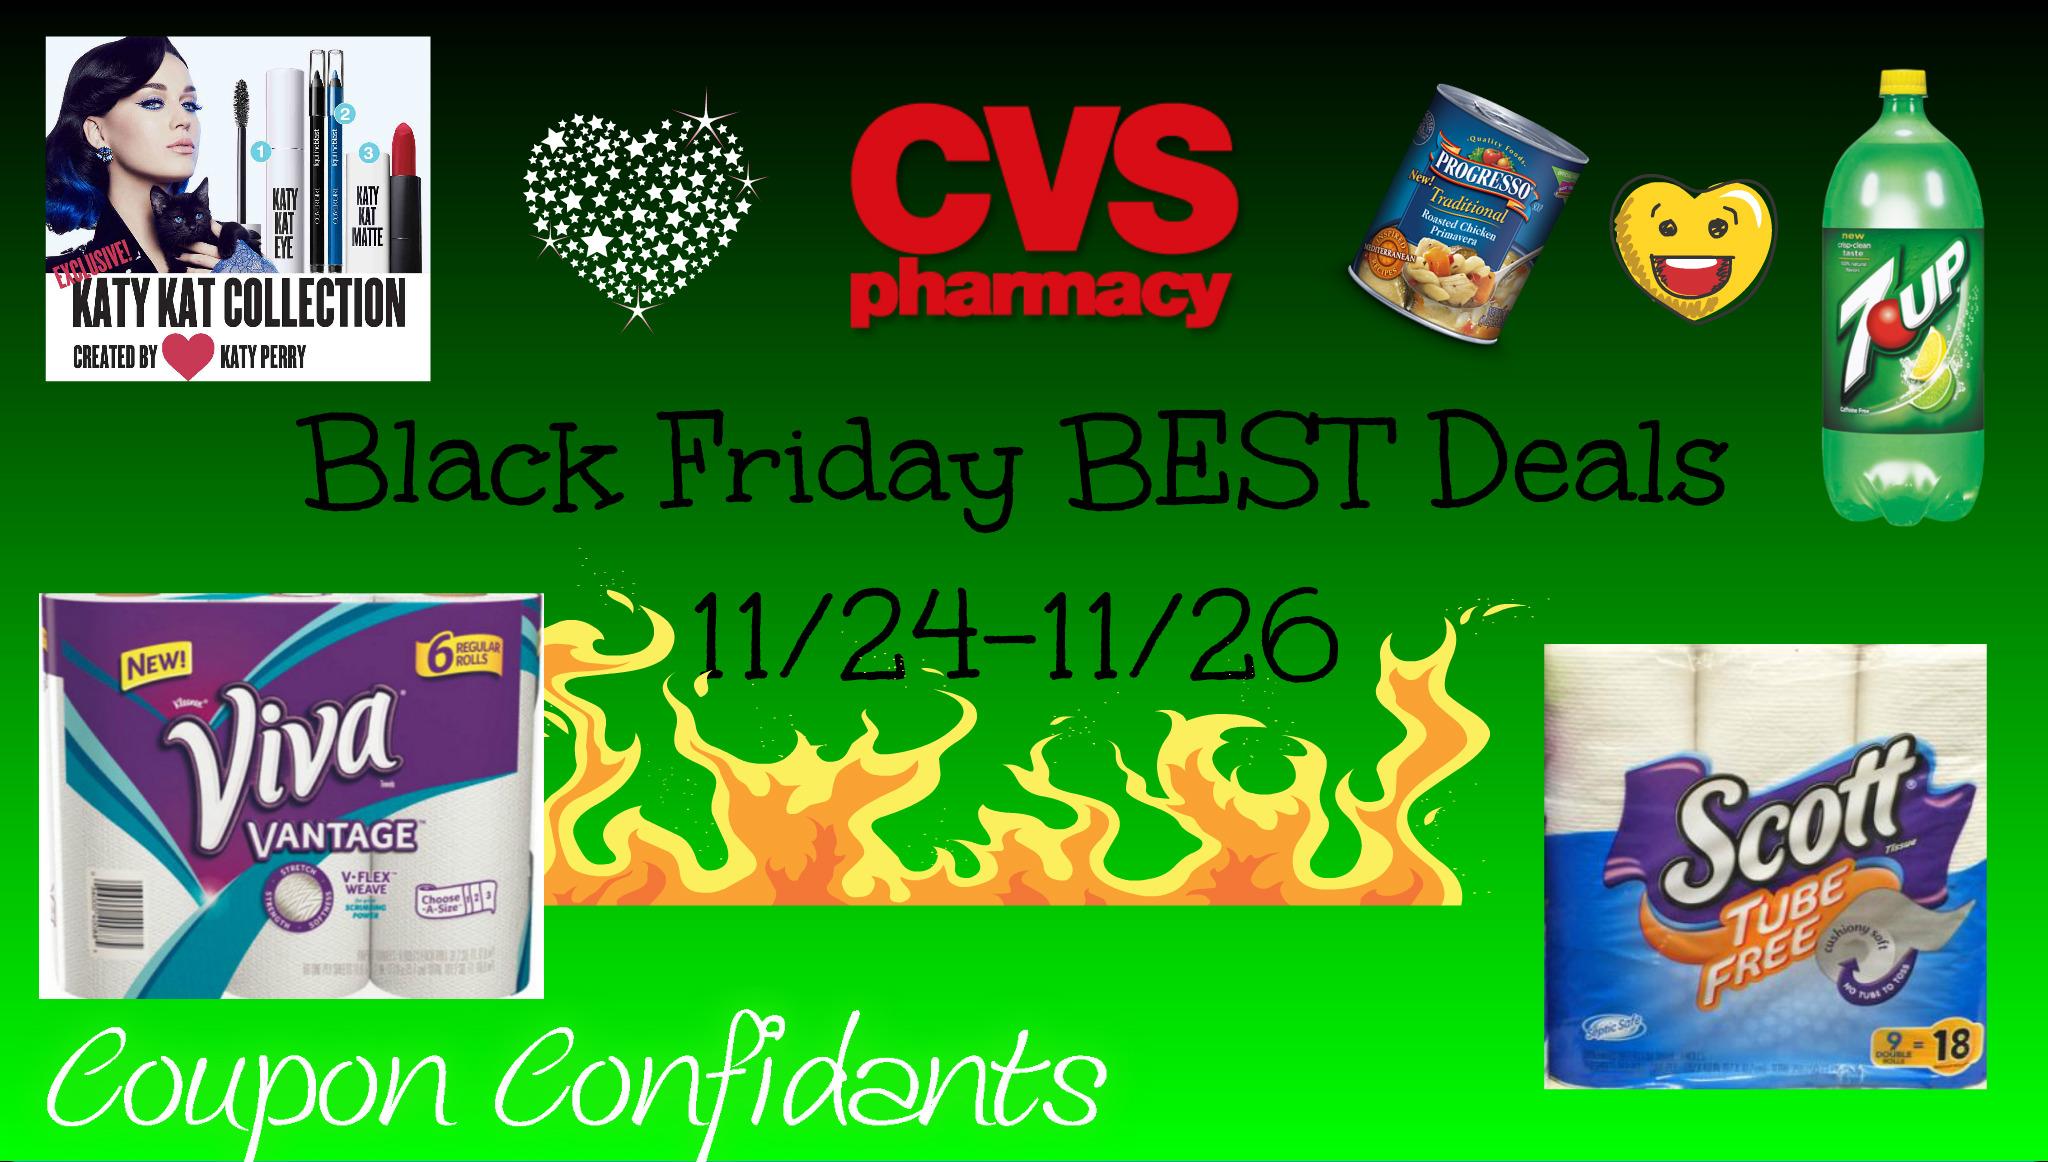 CVS NEWEST Deals 11/24 - 11/26 Black Friday ad Match ups!